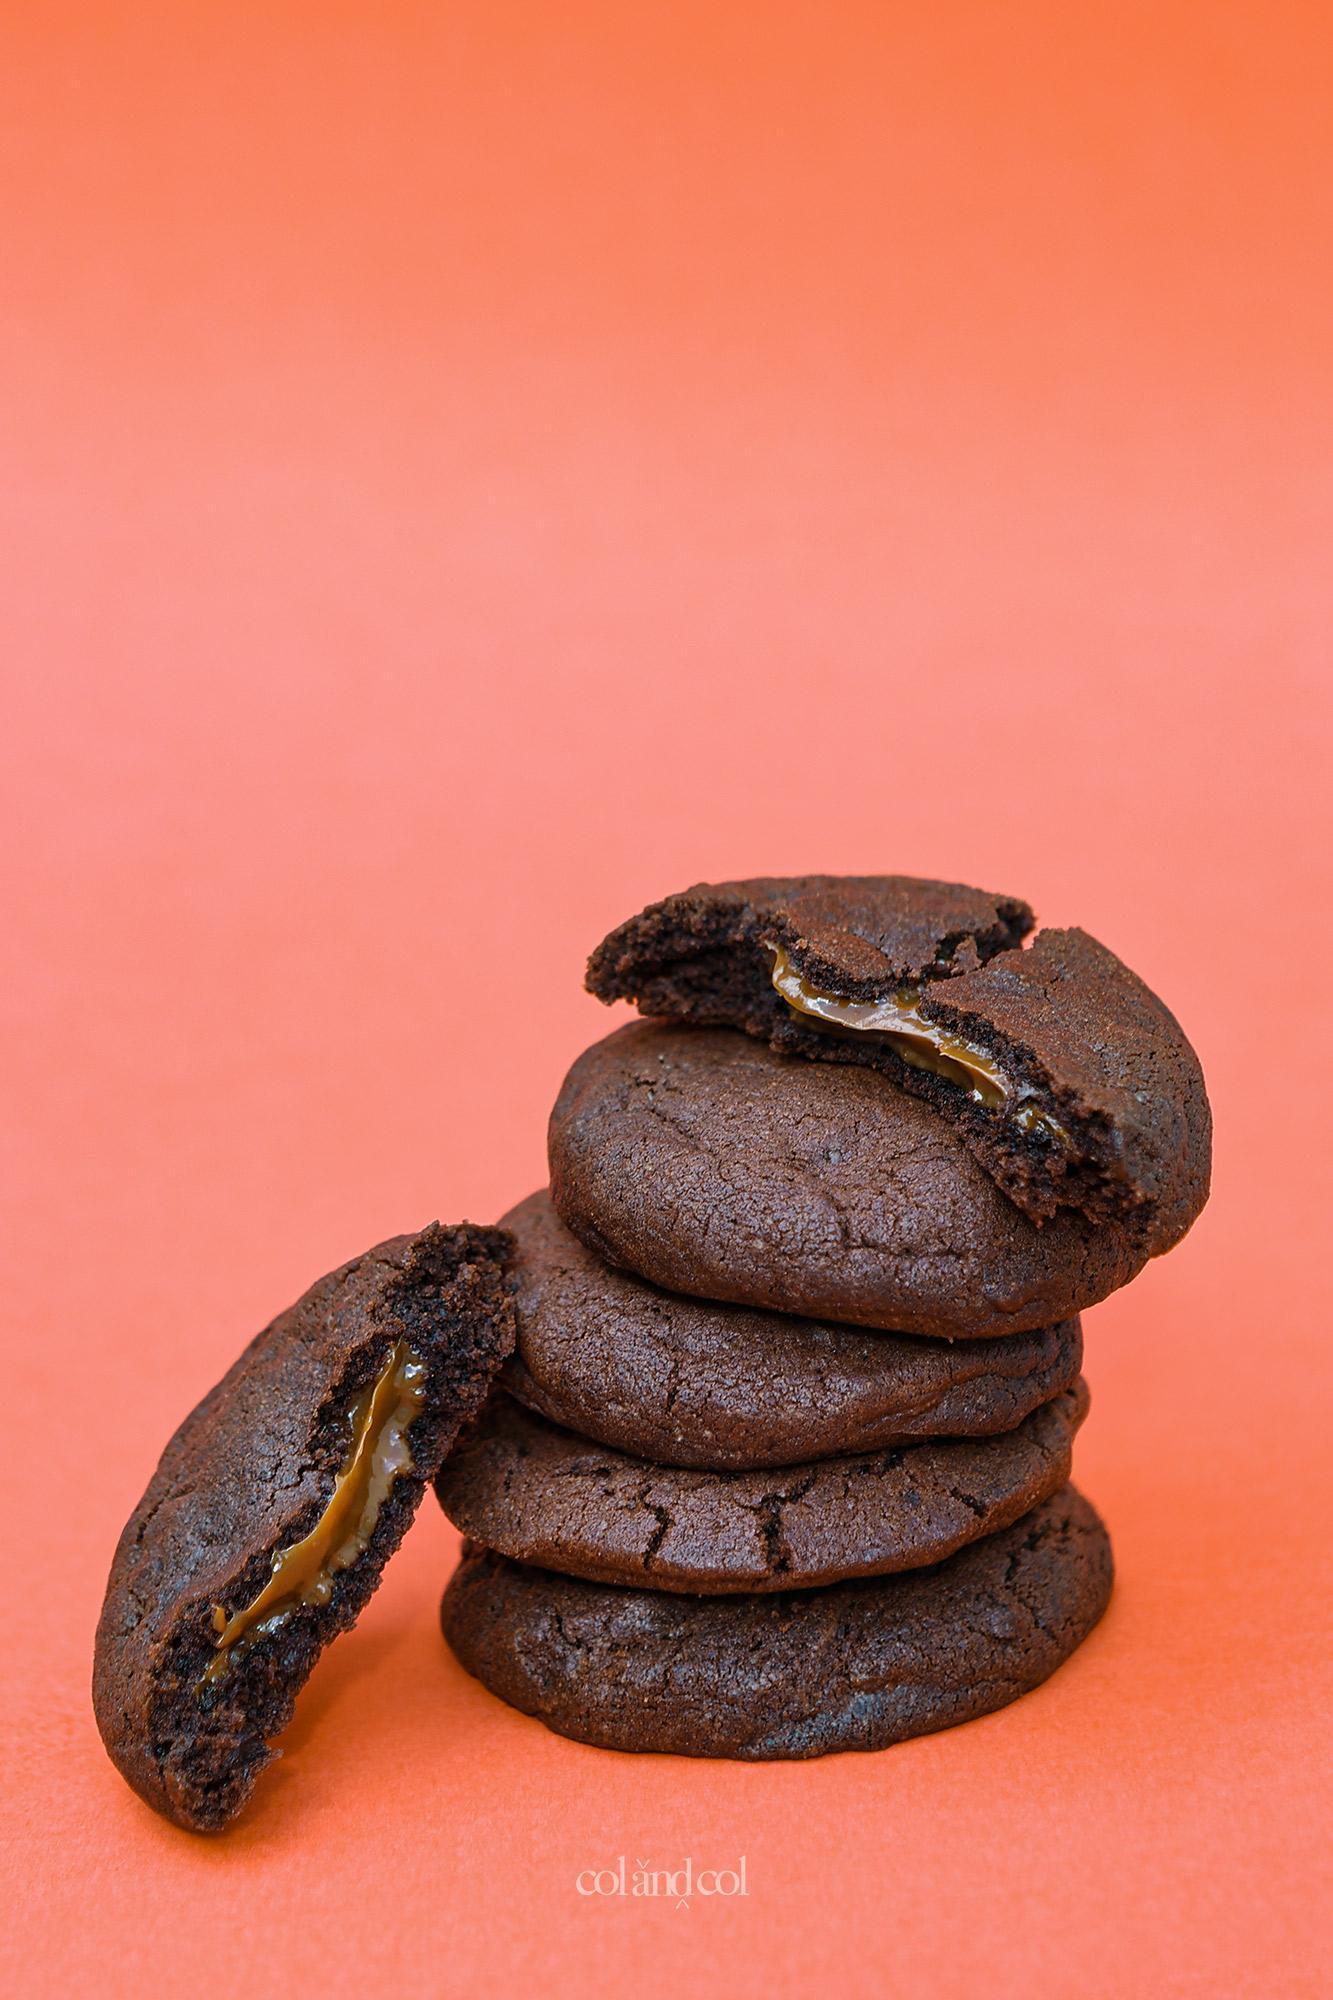 Cookies rellenas con nutella, mermelada, crema de cacahuete o dulce de leche